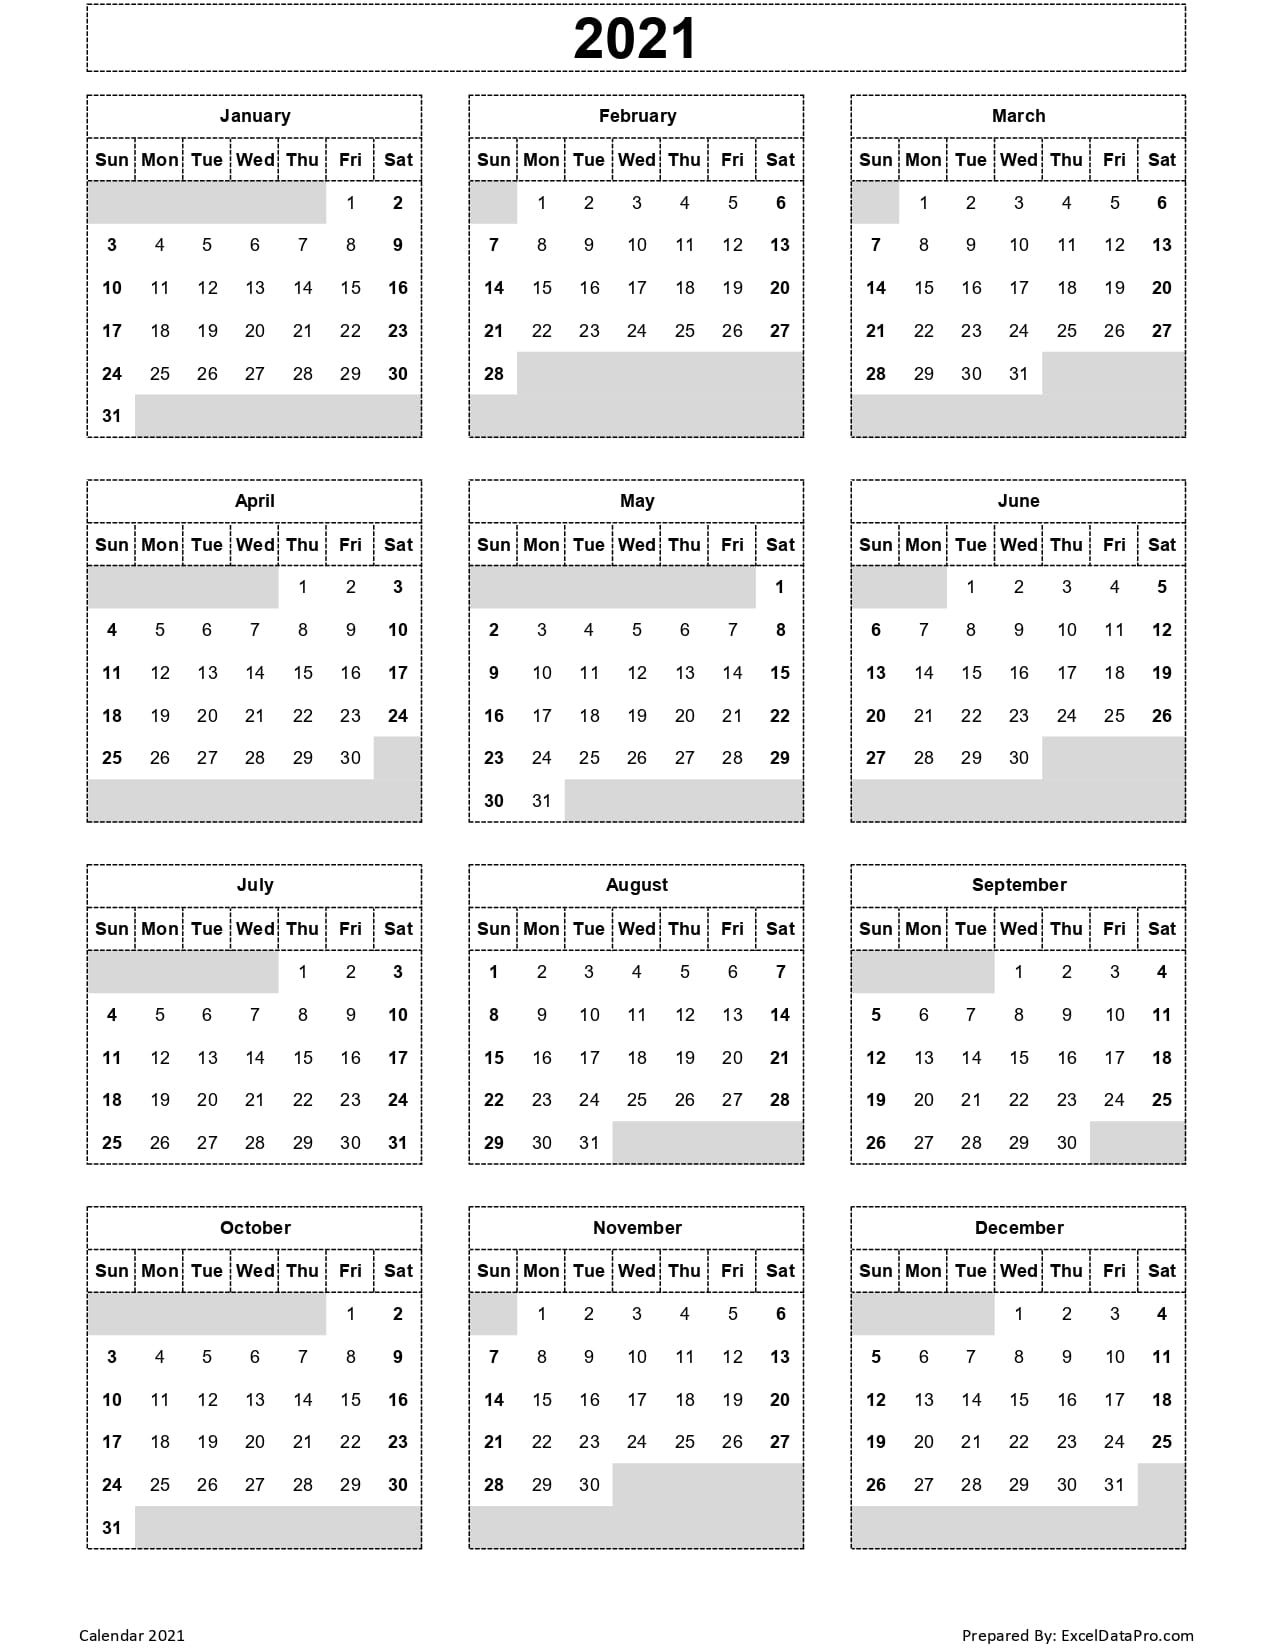 Calendar 2021 Excel Templates Printable Pdfs Images 1